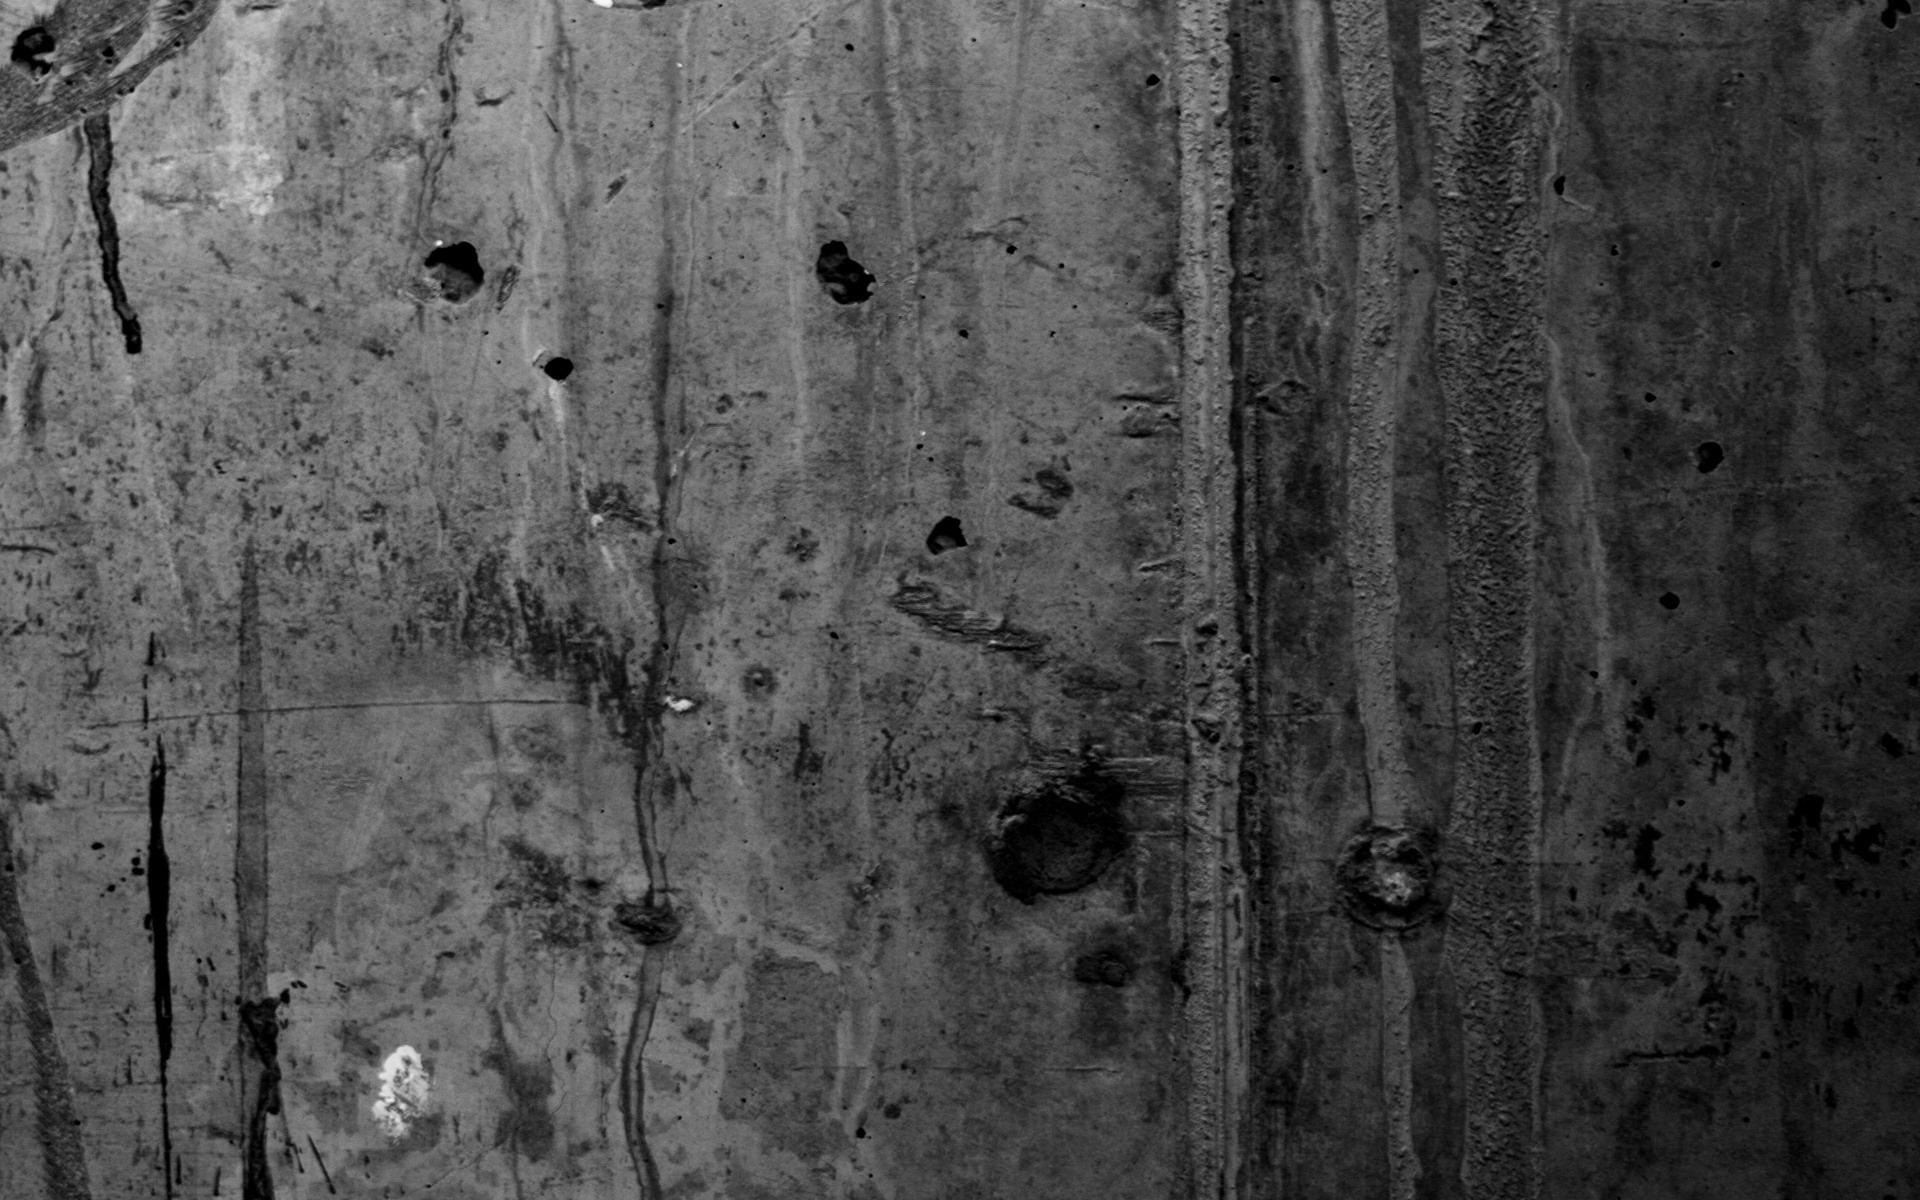 gray grey background hd wood wallpapers pc backgrounds desktop texture breathtaking horseman headless dark silver wallpapersafari pink quality fantasy